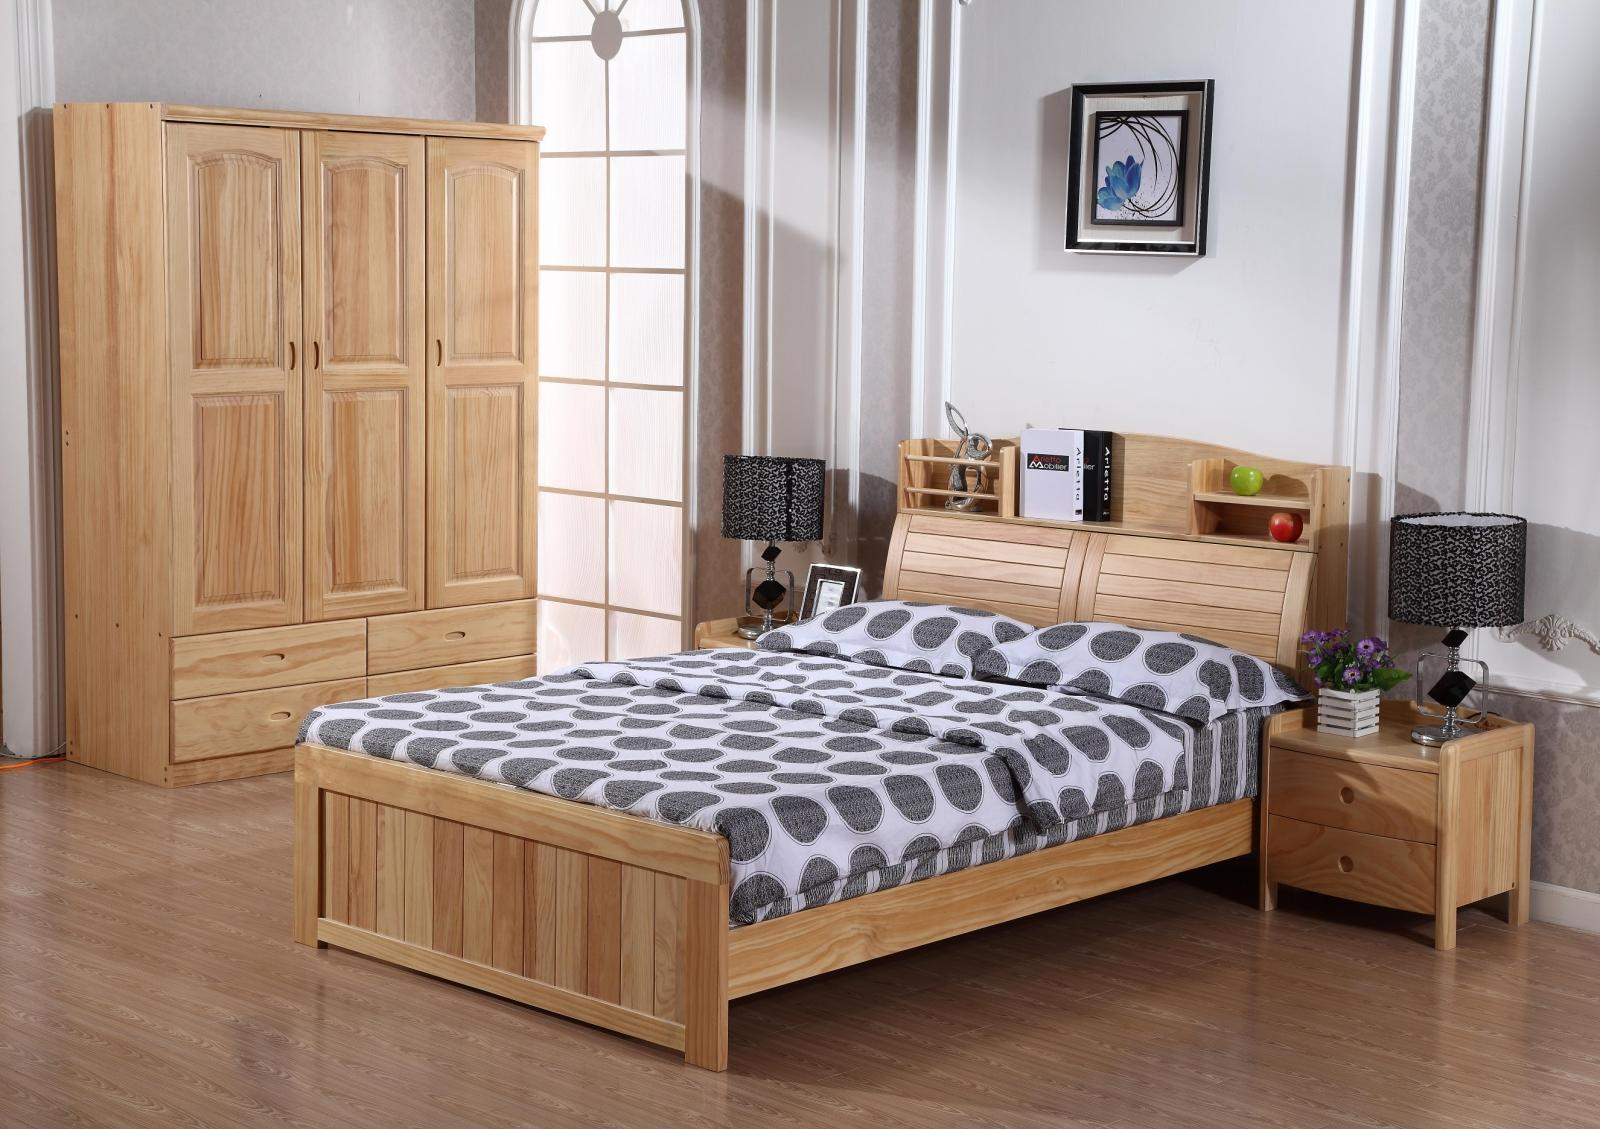 Fullsize Of Solid Wood Bedroom Furniture